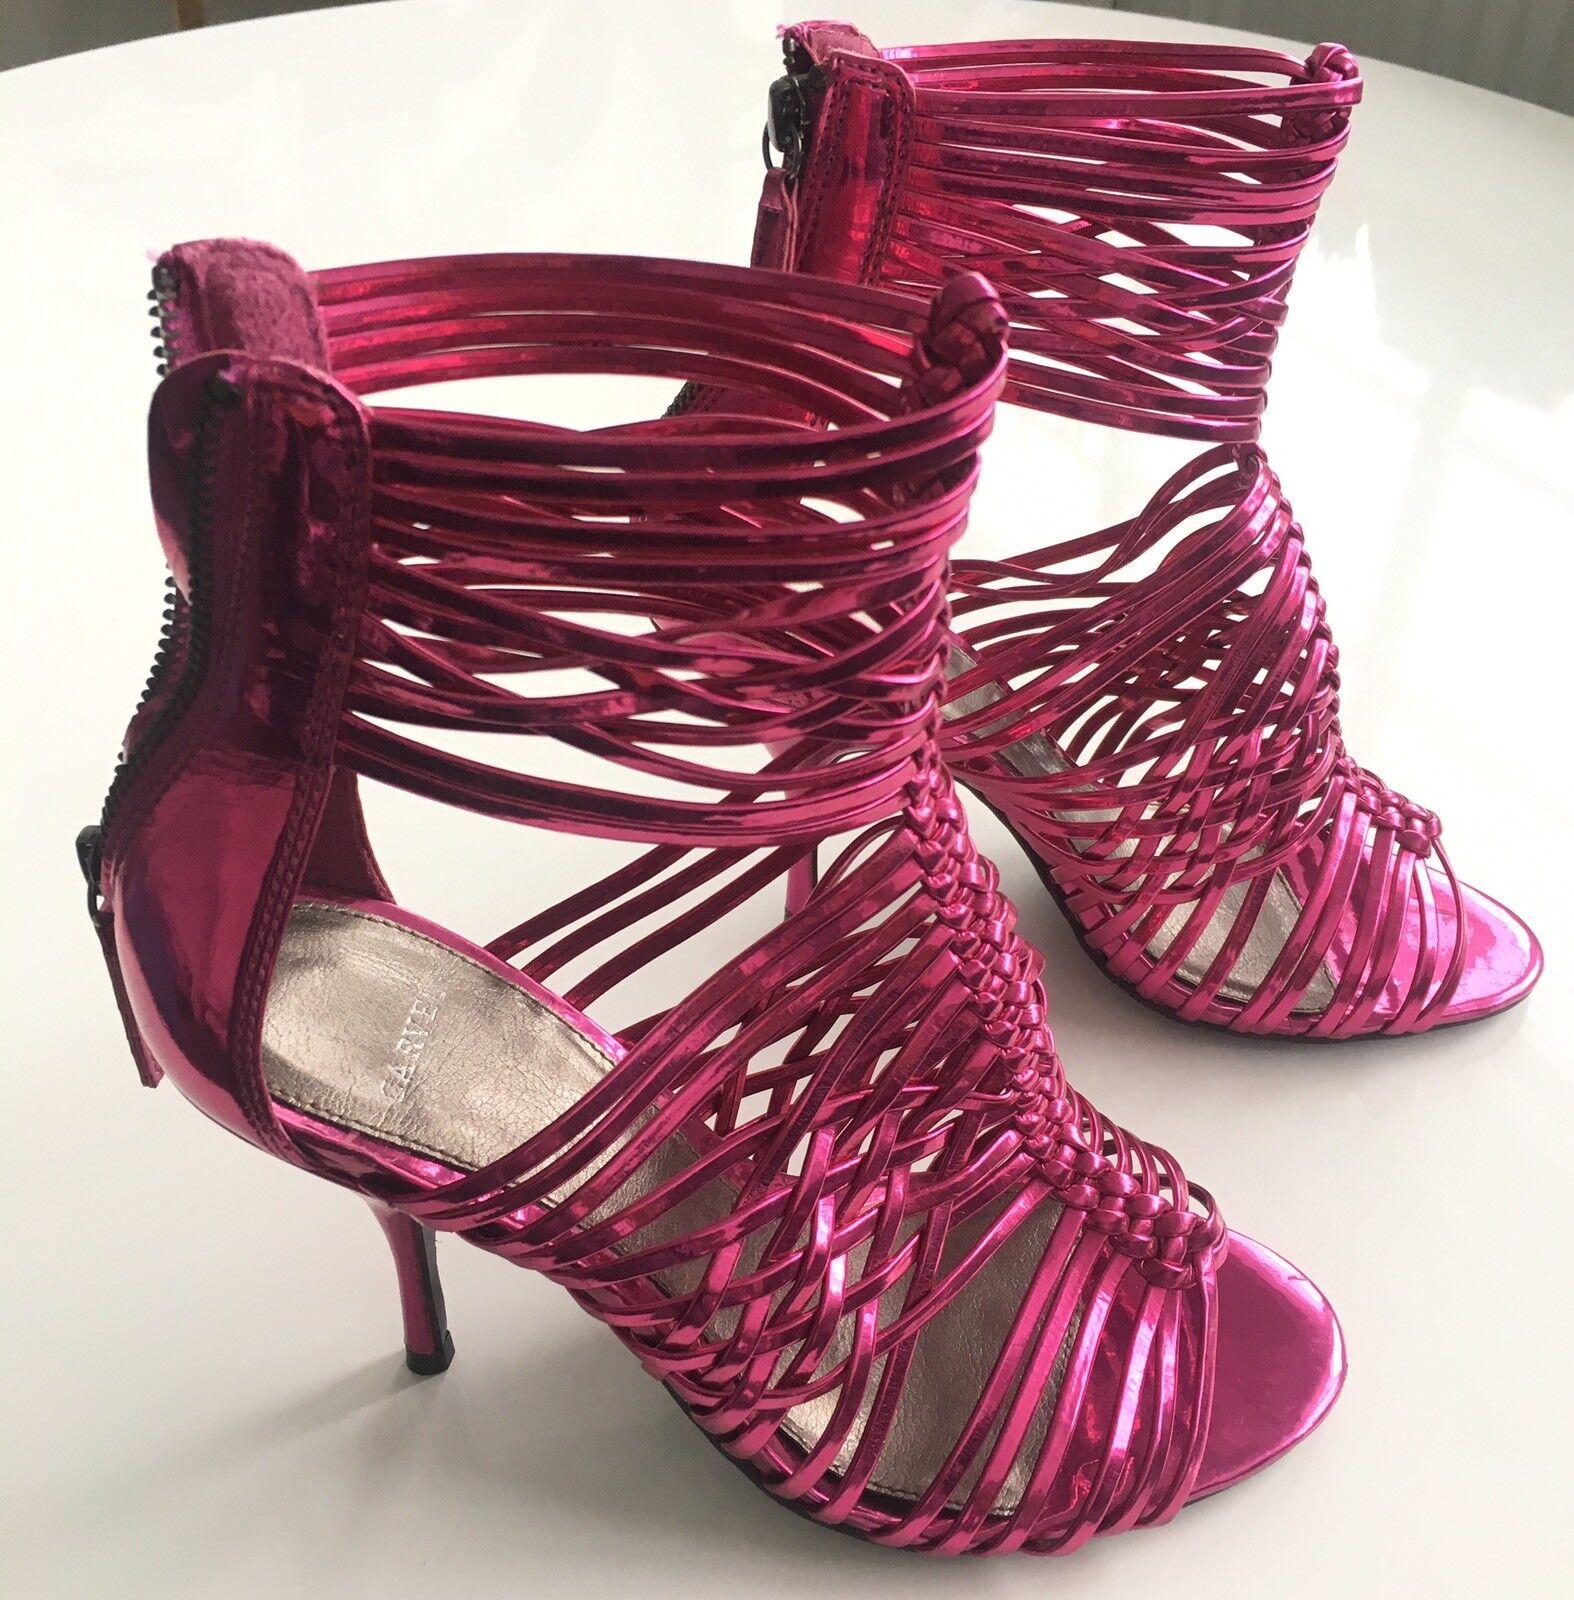 NEW CARVELA Kurt Geiger Heel Ankle Strap Sandal Peeptoe Shoes Pink Metallic £129